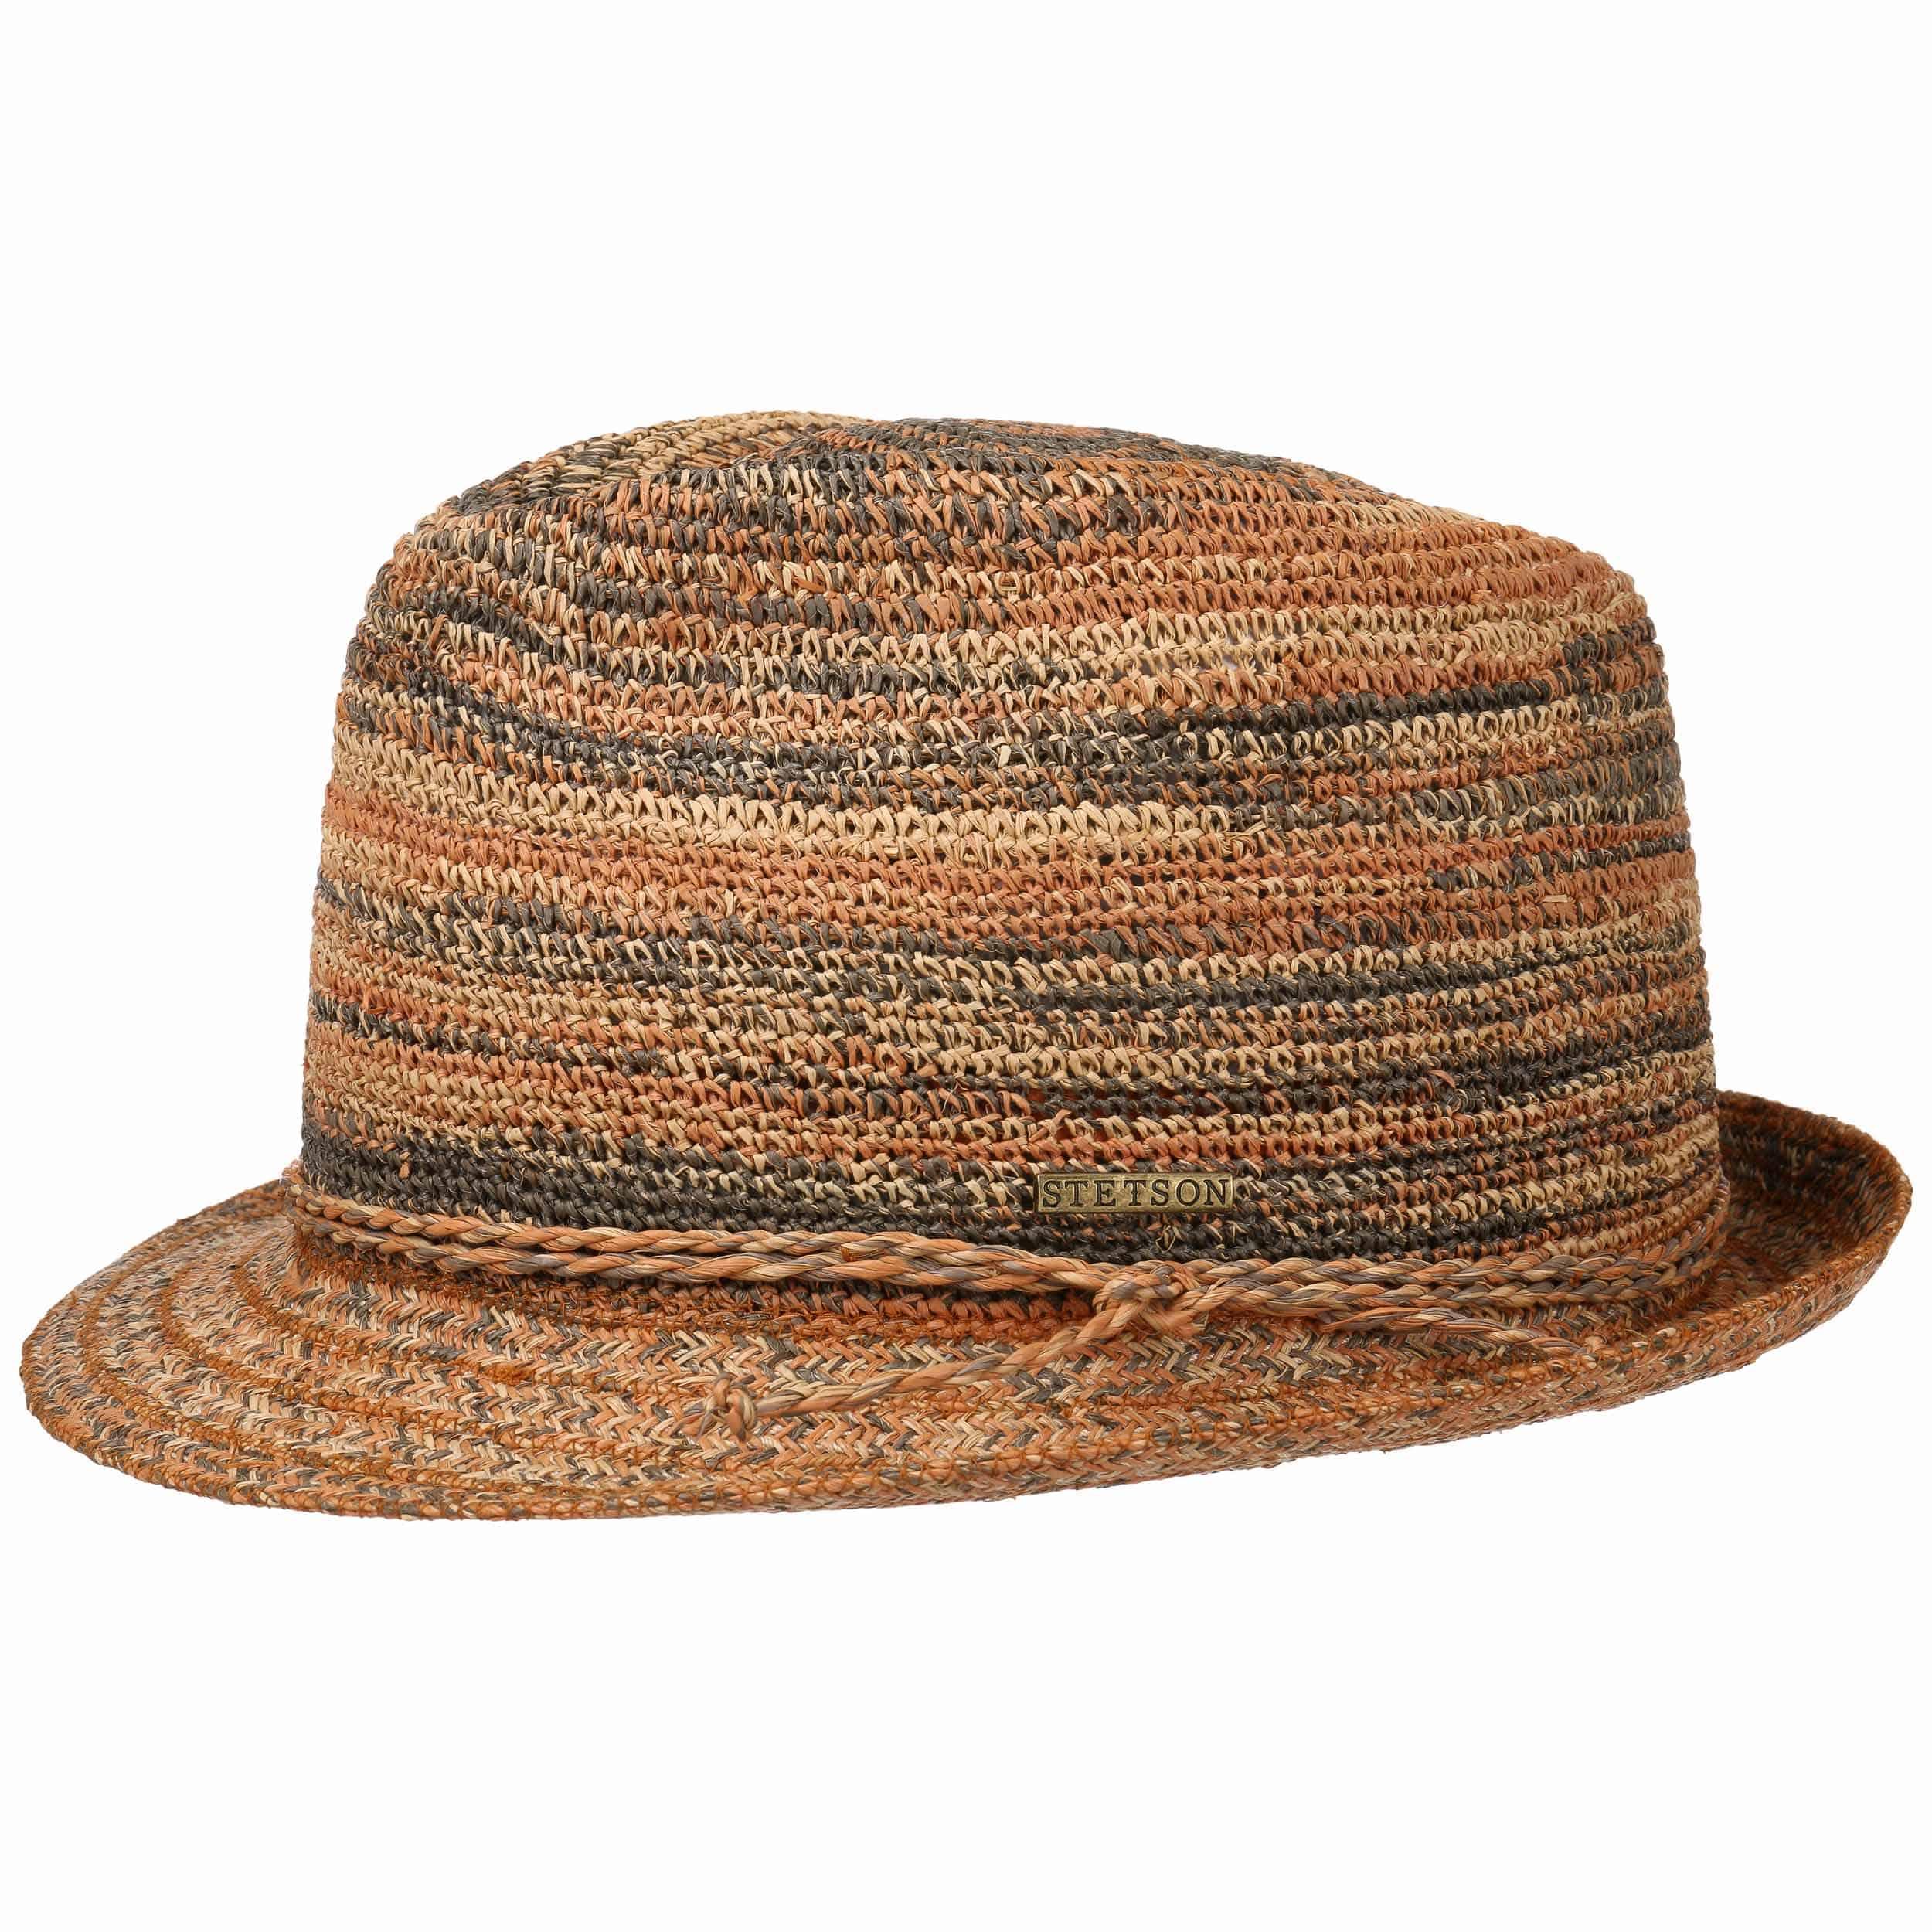 Raffia Crochet Trilby Straw Hat. by Stetson d3409d282f8